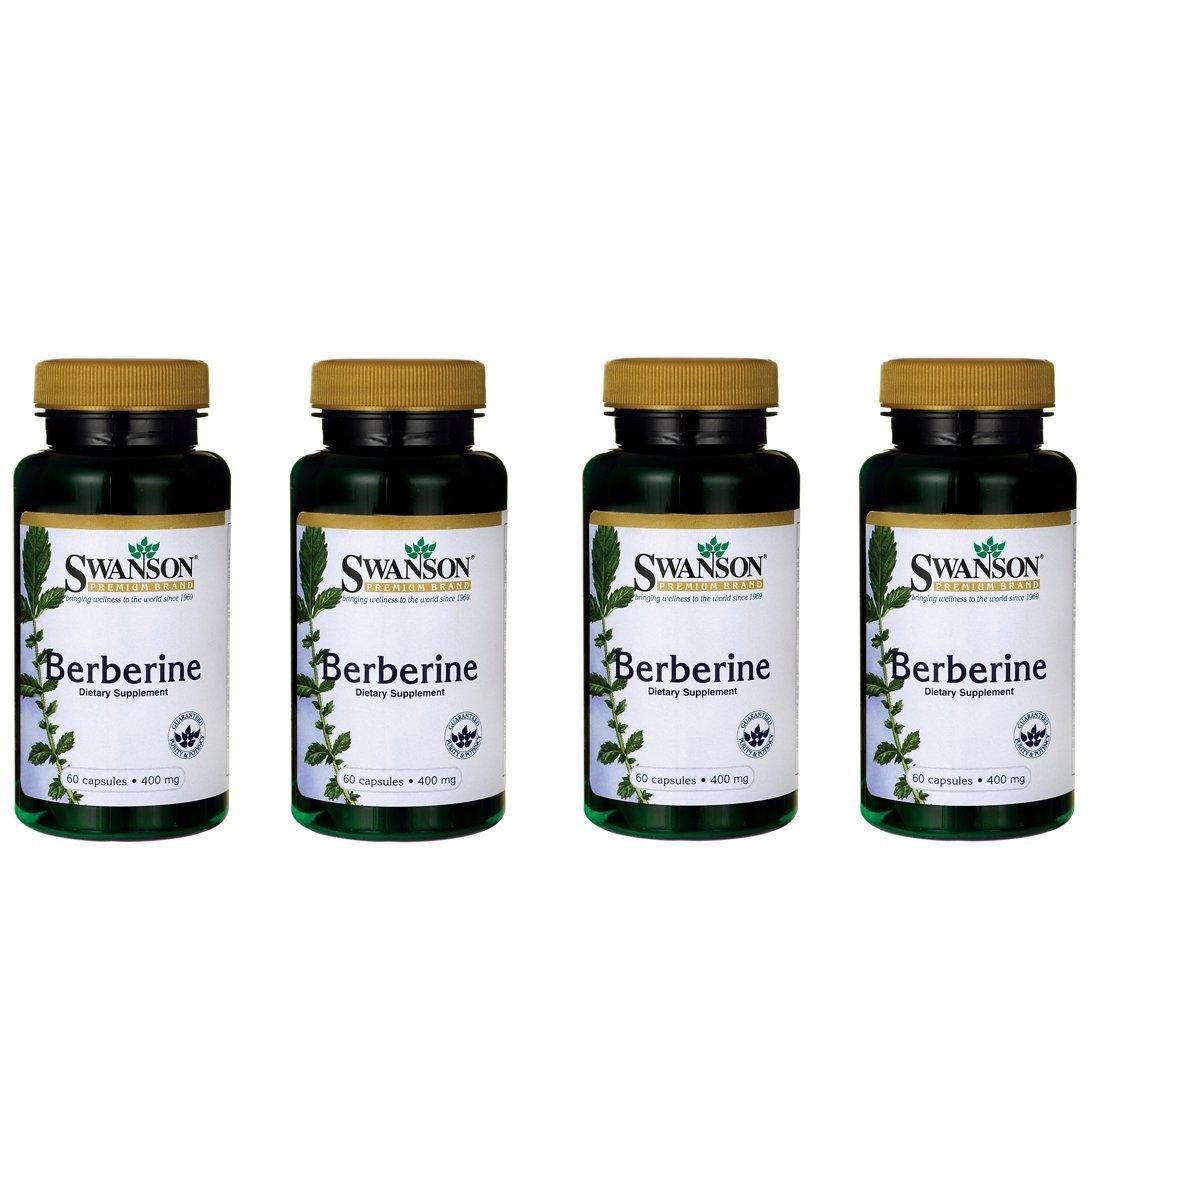 Swanson Berberine Glucose Metabolism Blood Sugar Cholesterol Cardiovascular Support Supplement 400 mg 60 Capsules (4 Pack)